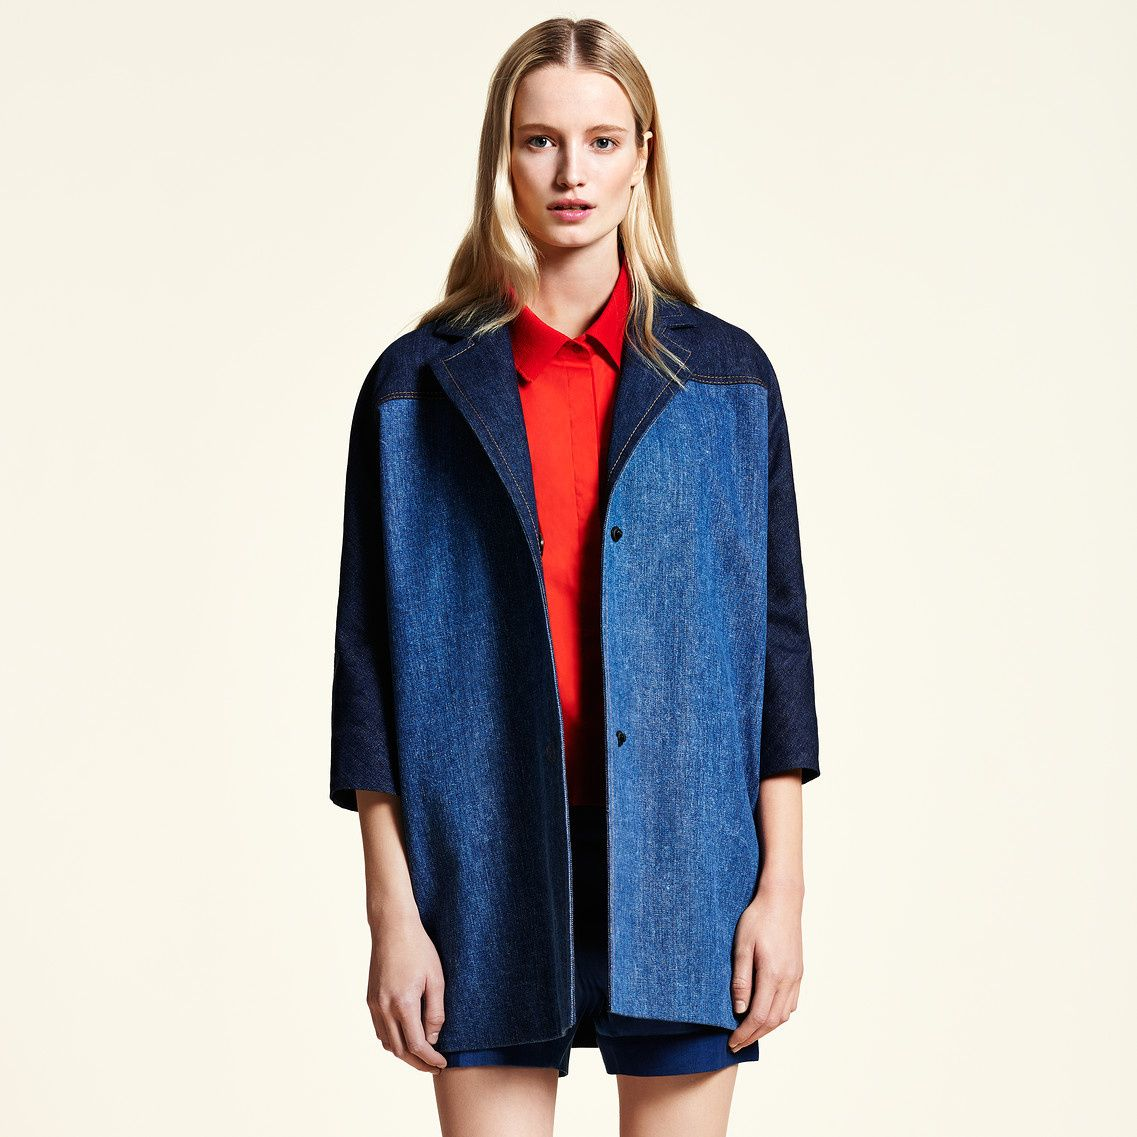 Hilfiger Collection Denim Coat | Official Tommy Hilfiger Store